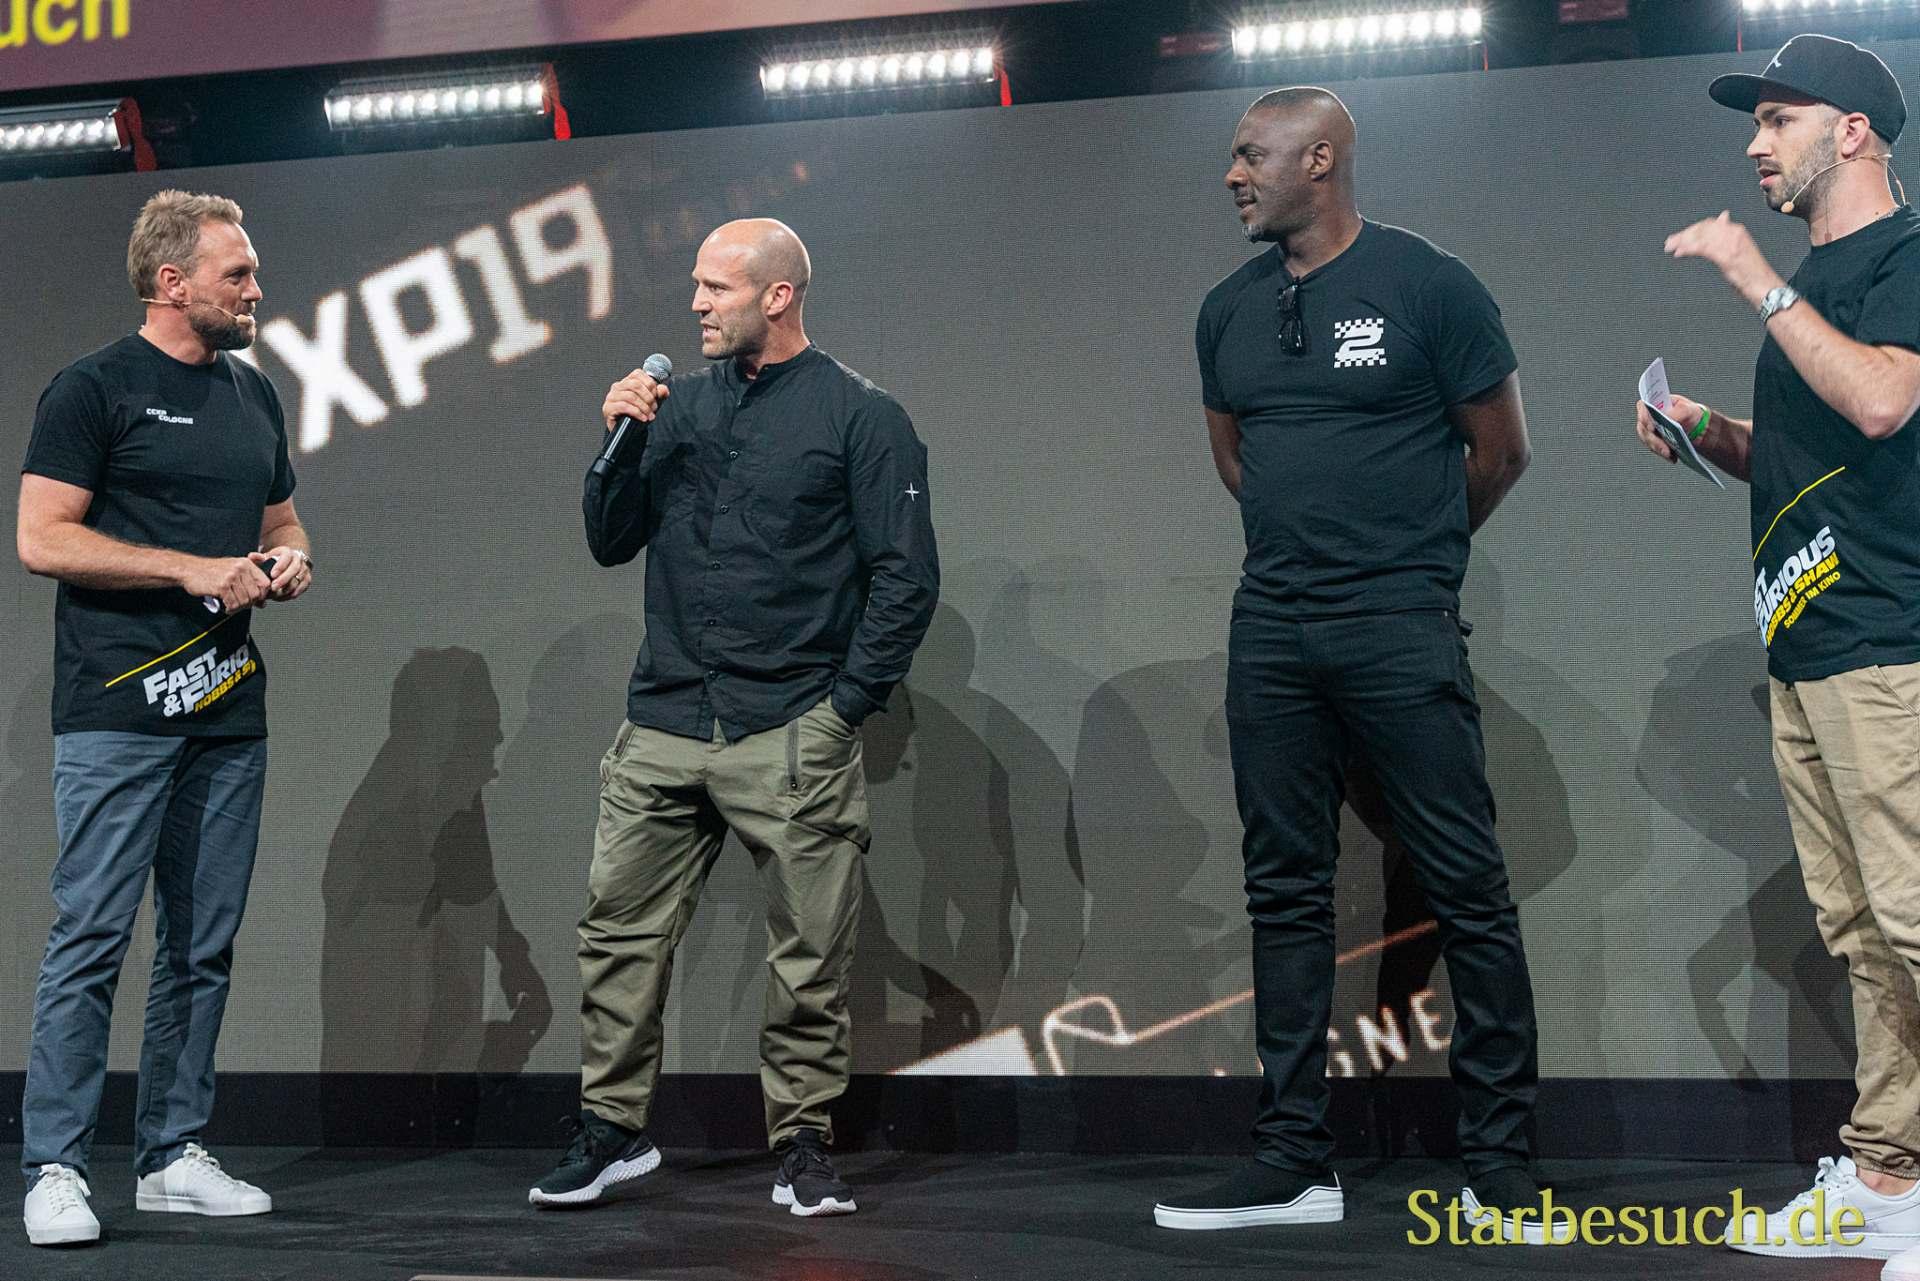 COLOGNE, GERMANY - JUN 28th 2019: Jason Statham, Idris Elba and Steven Gätjen at CCXP Cologne